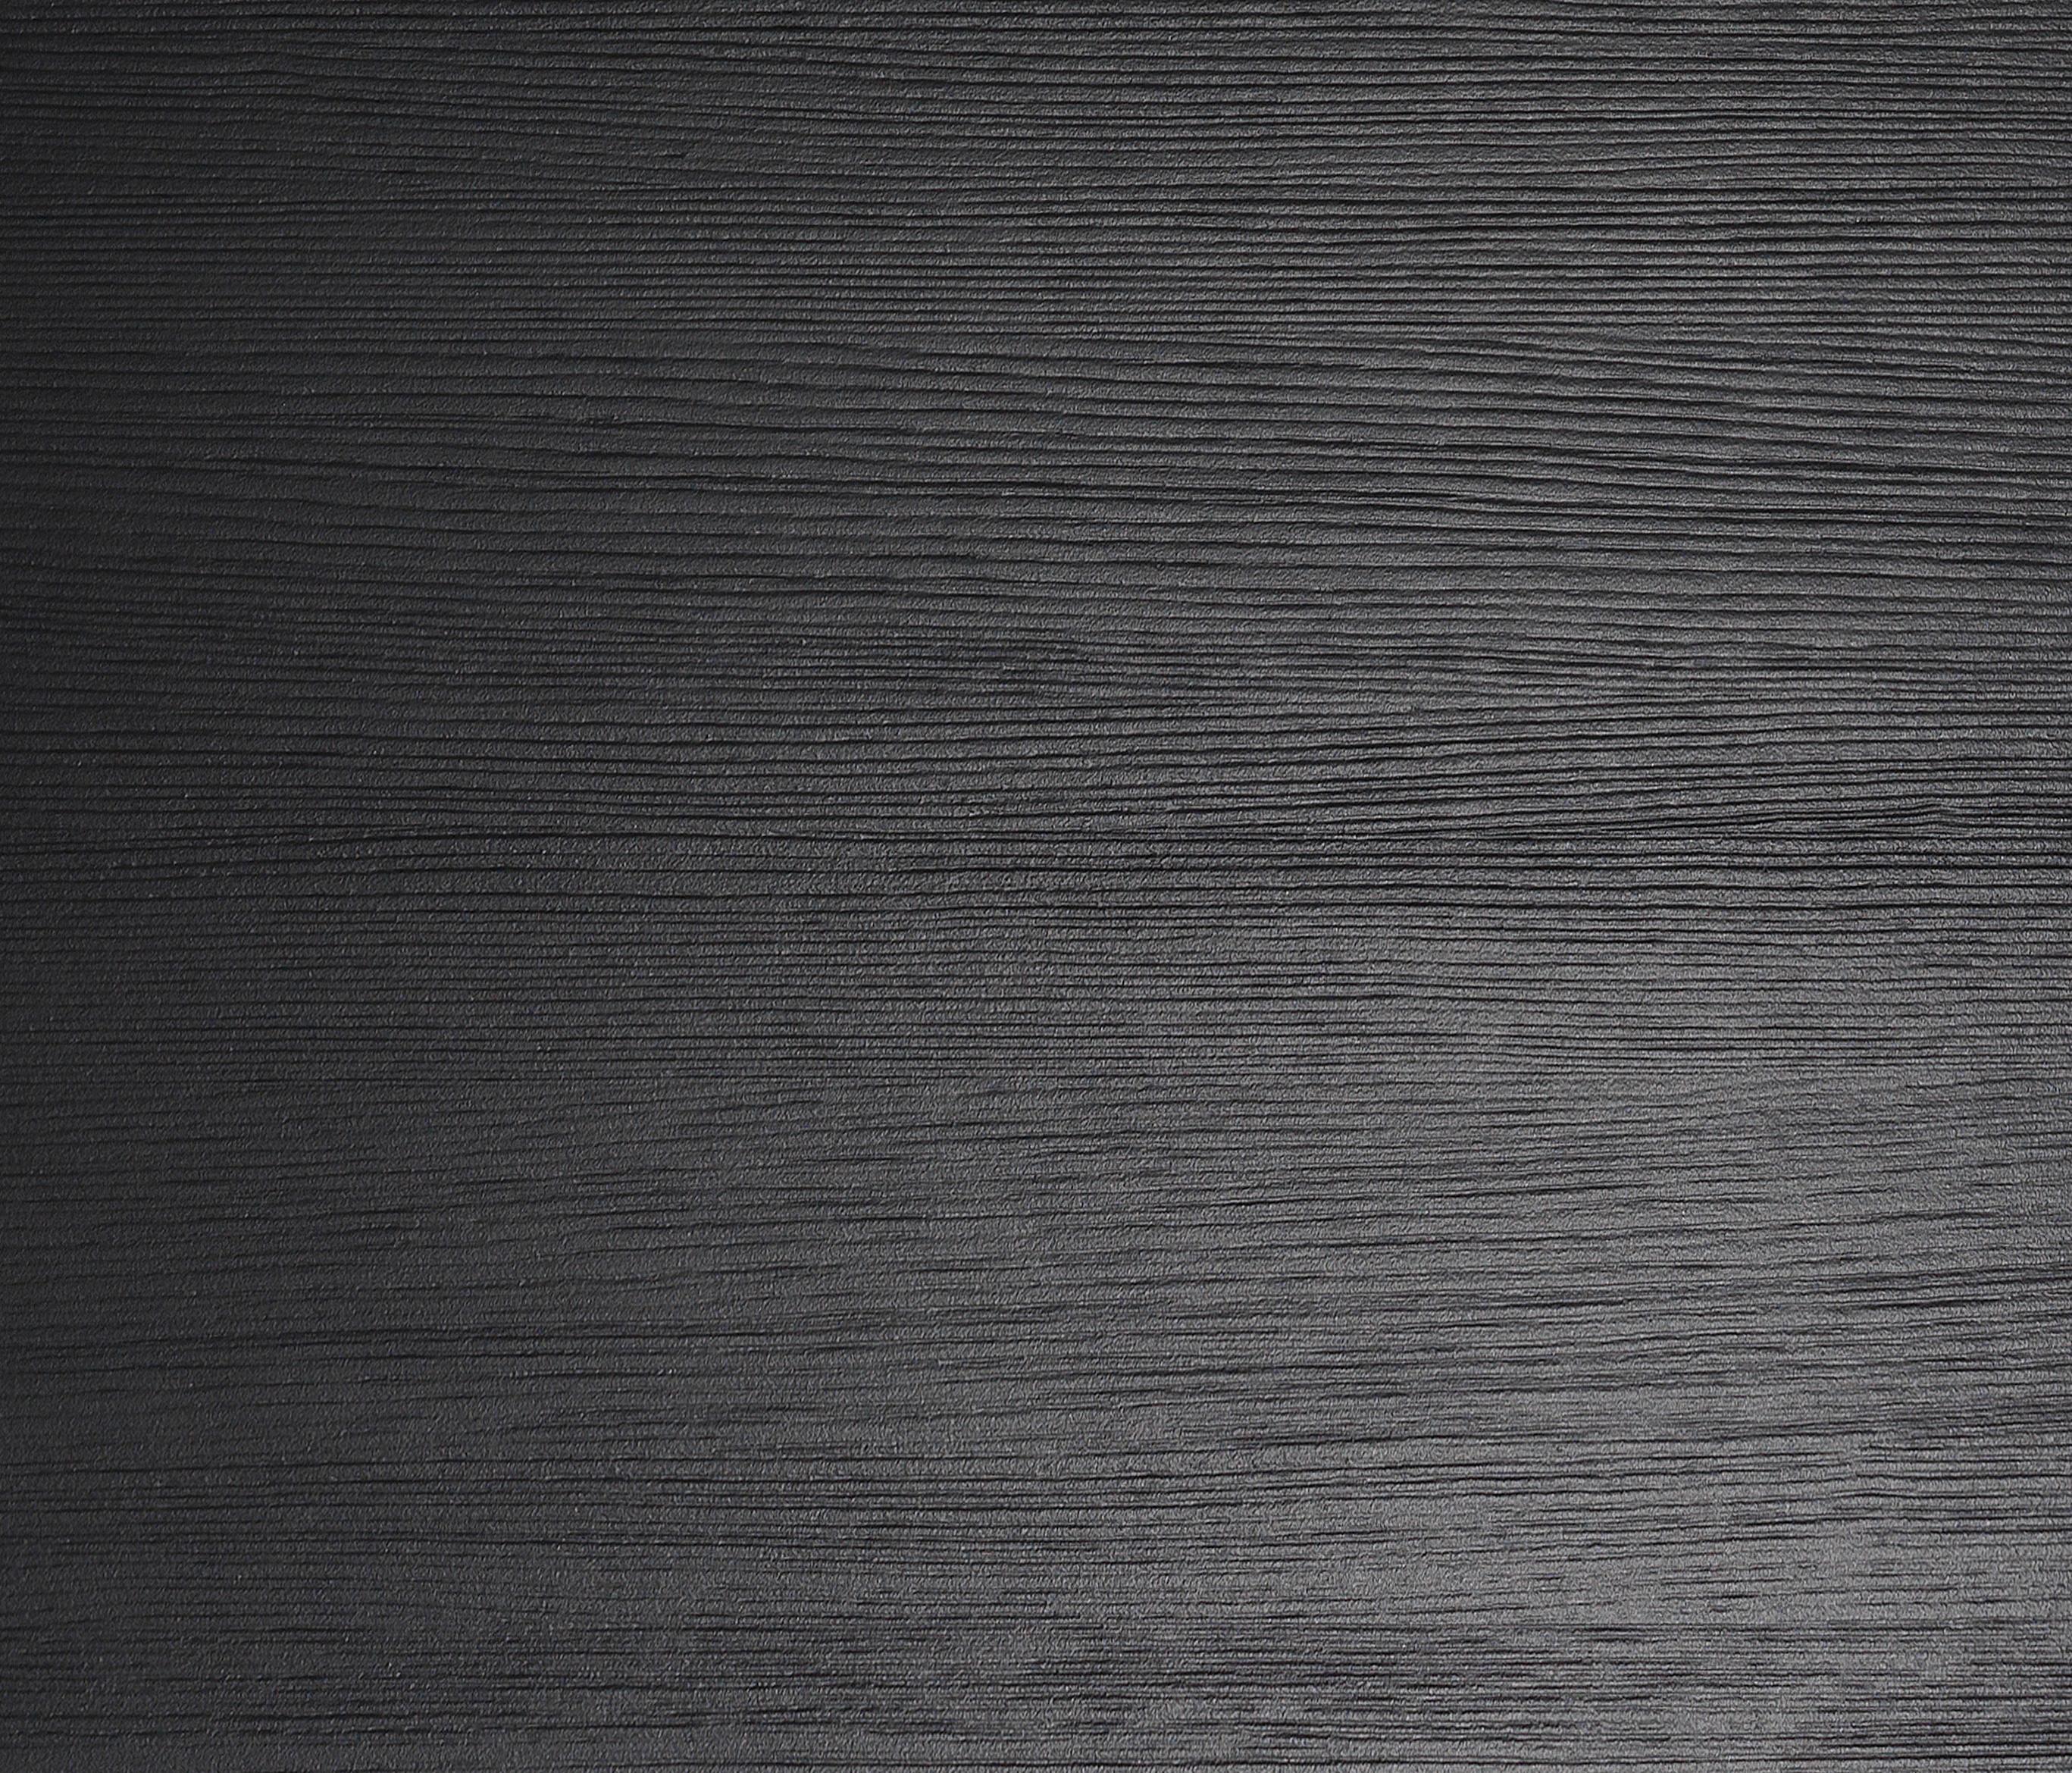 80 8 negro natural sk carrelage pour sol de inalco. Black Bedroom Furniture Sets. Home Design Ideas